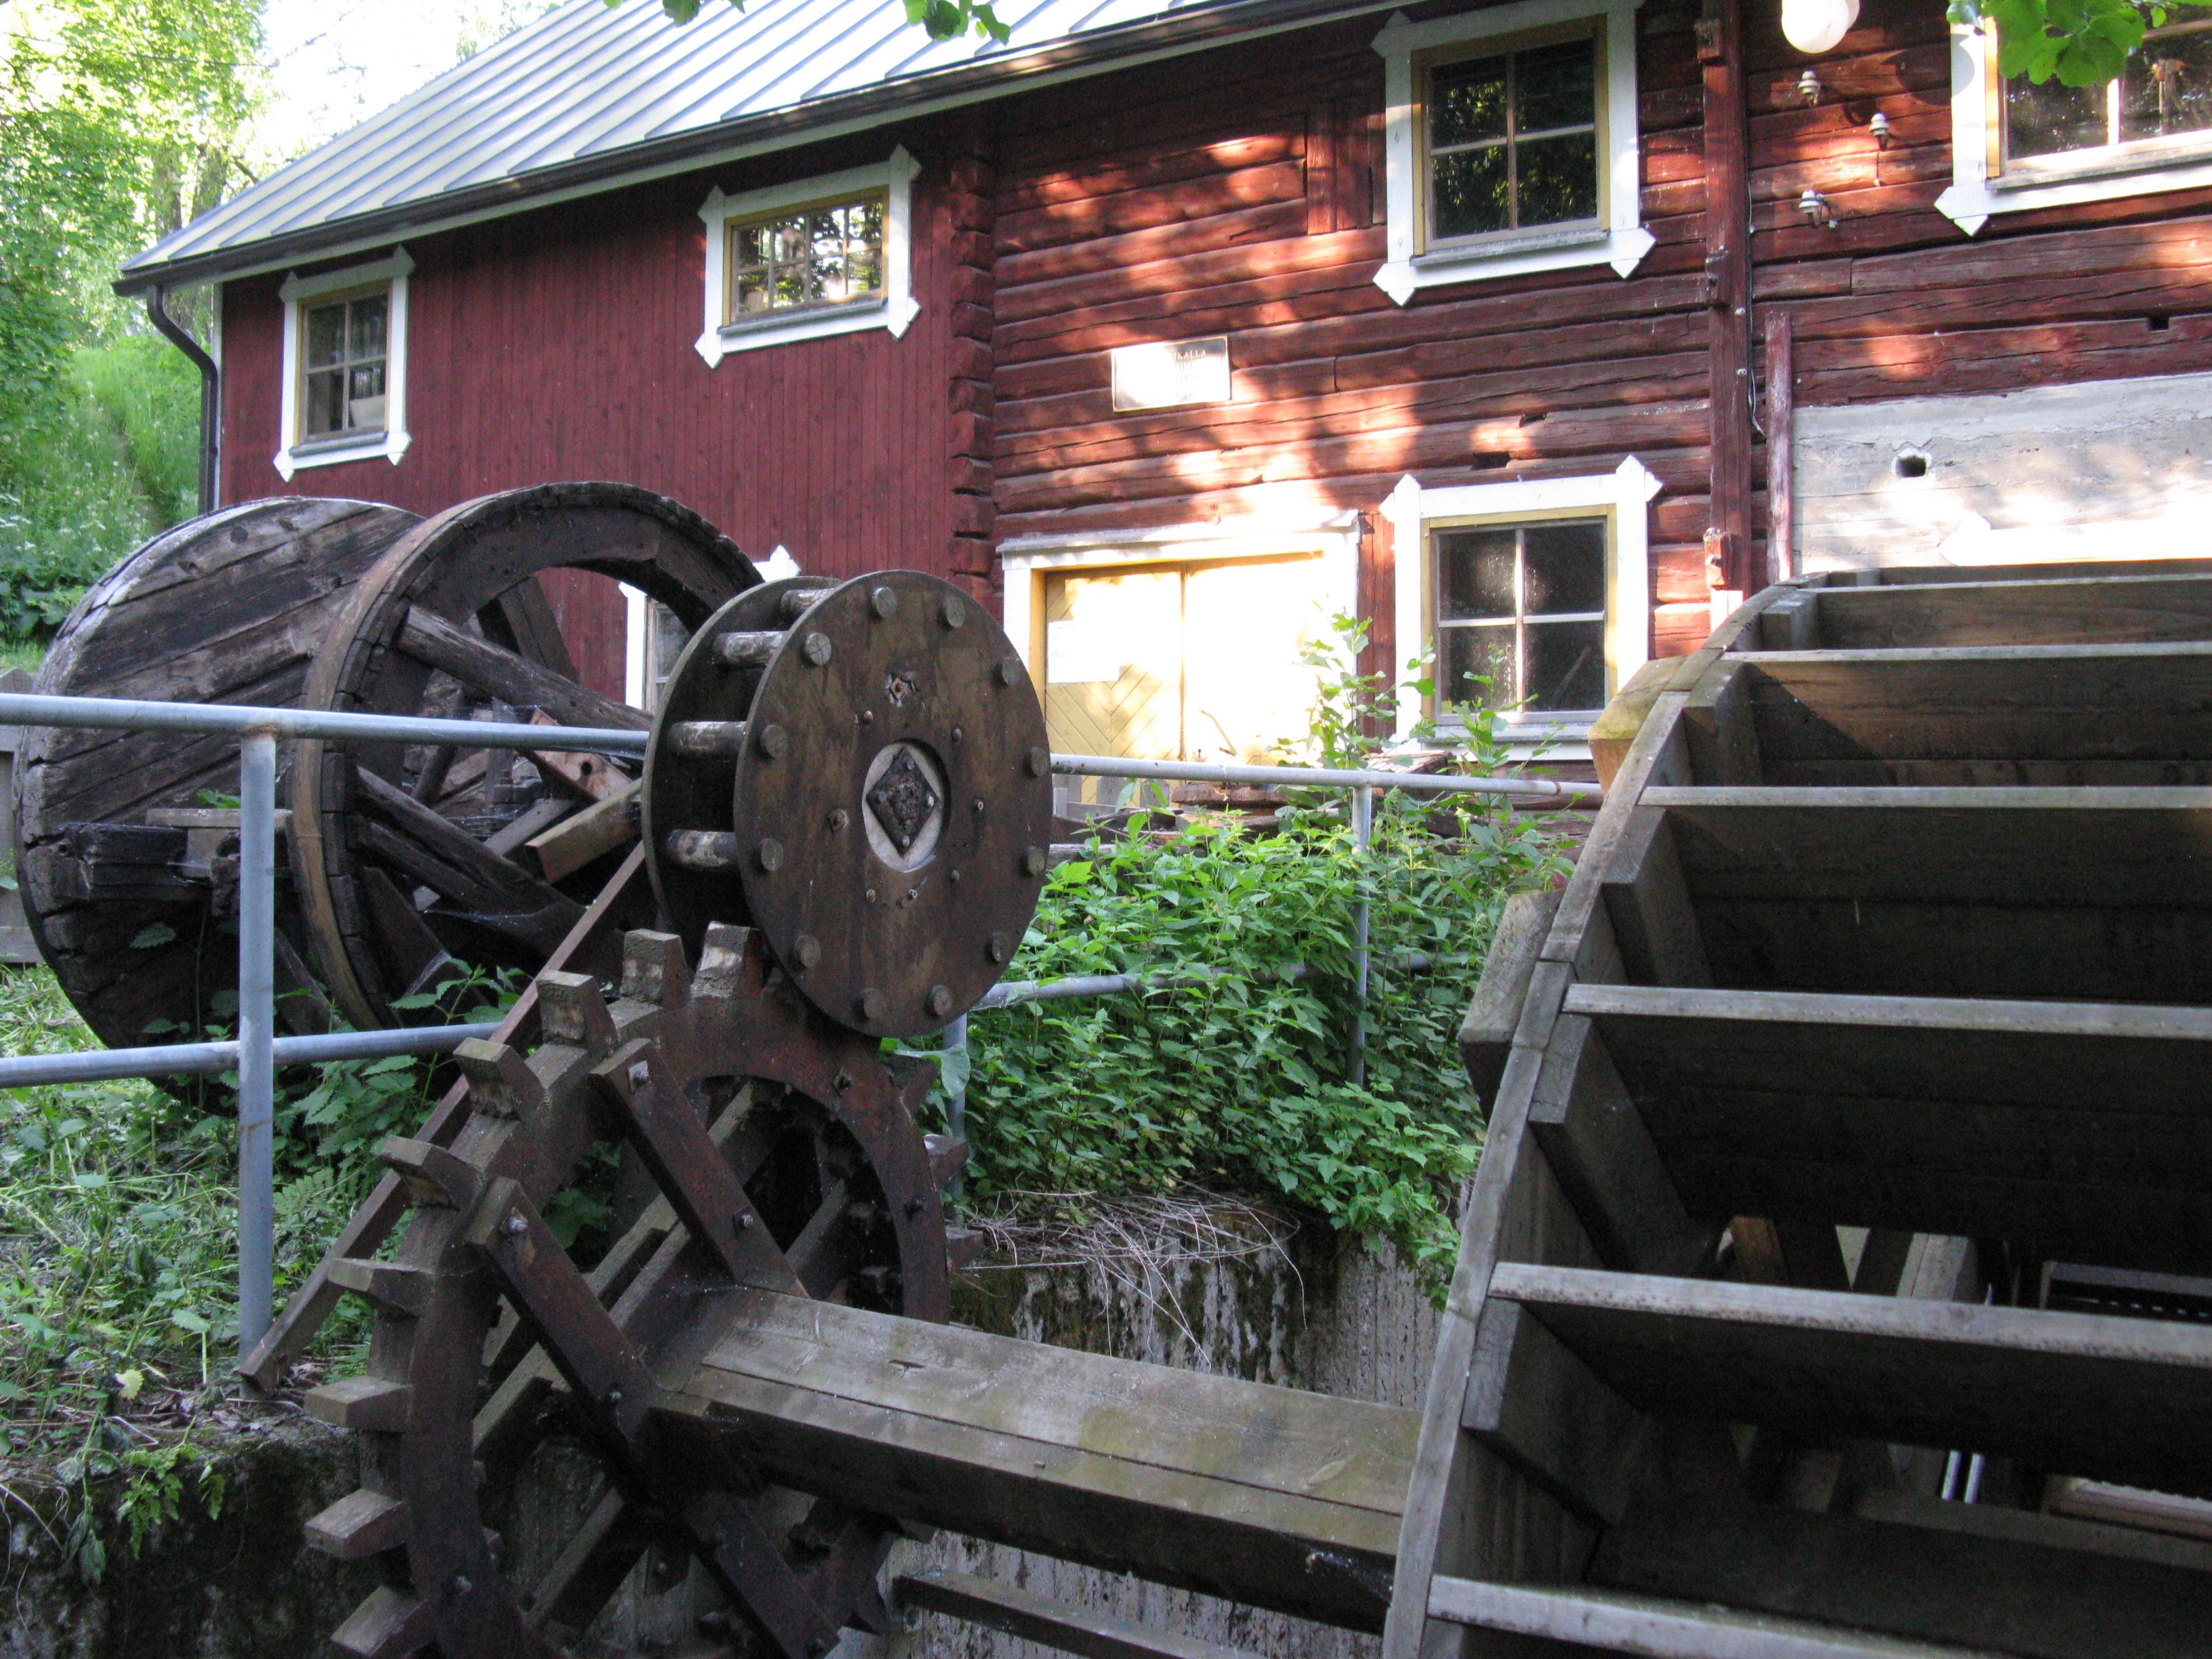 Vesimyllymuseo